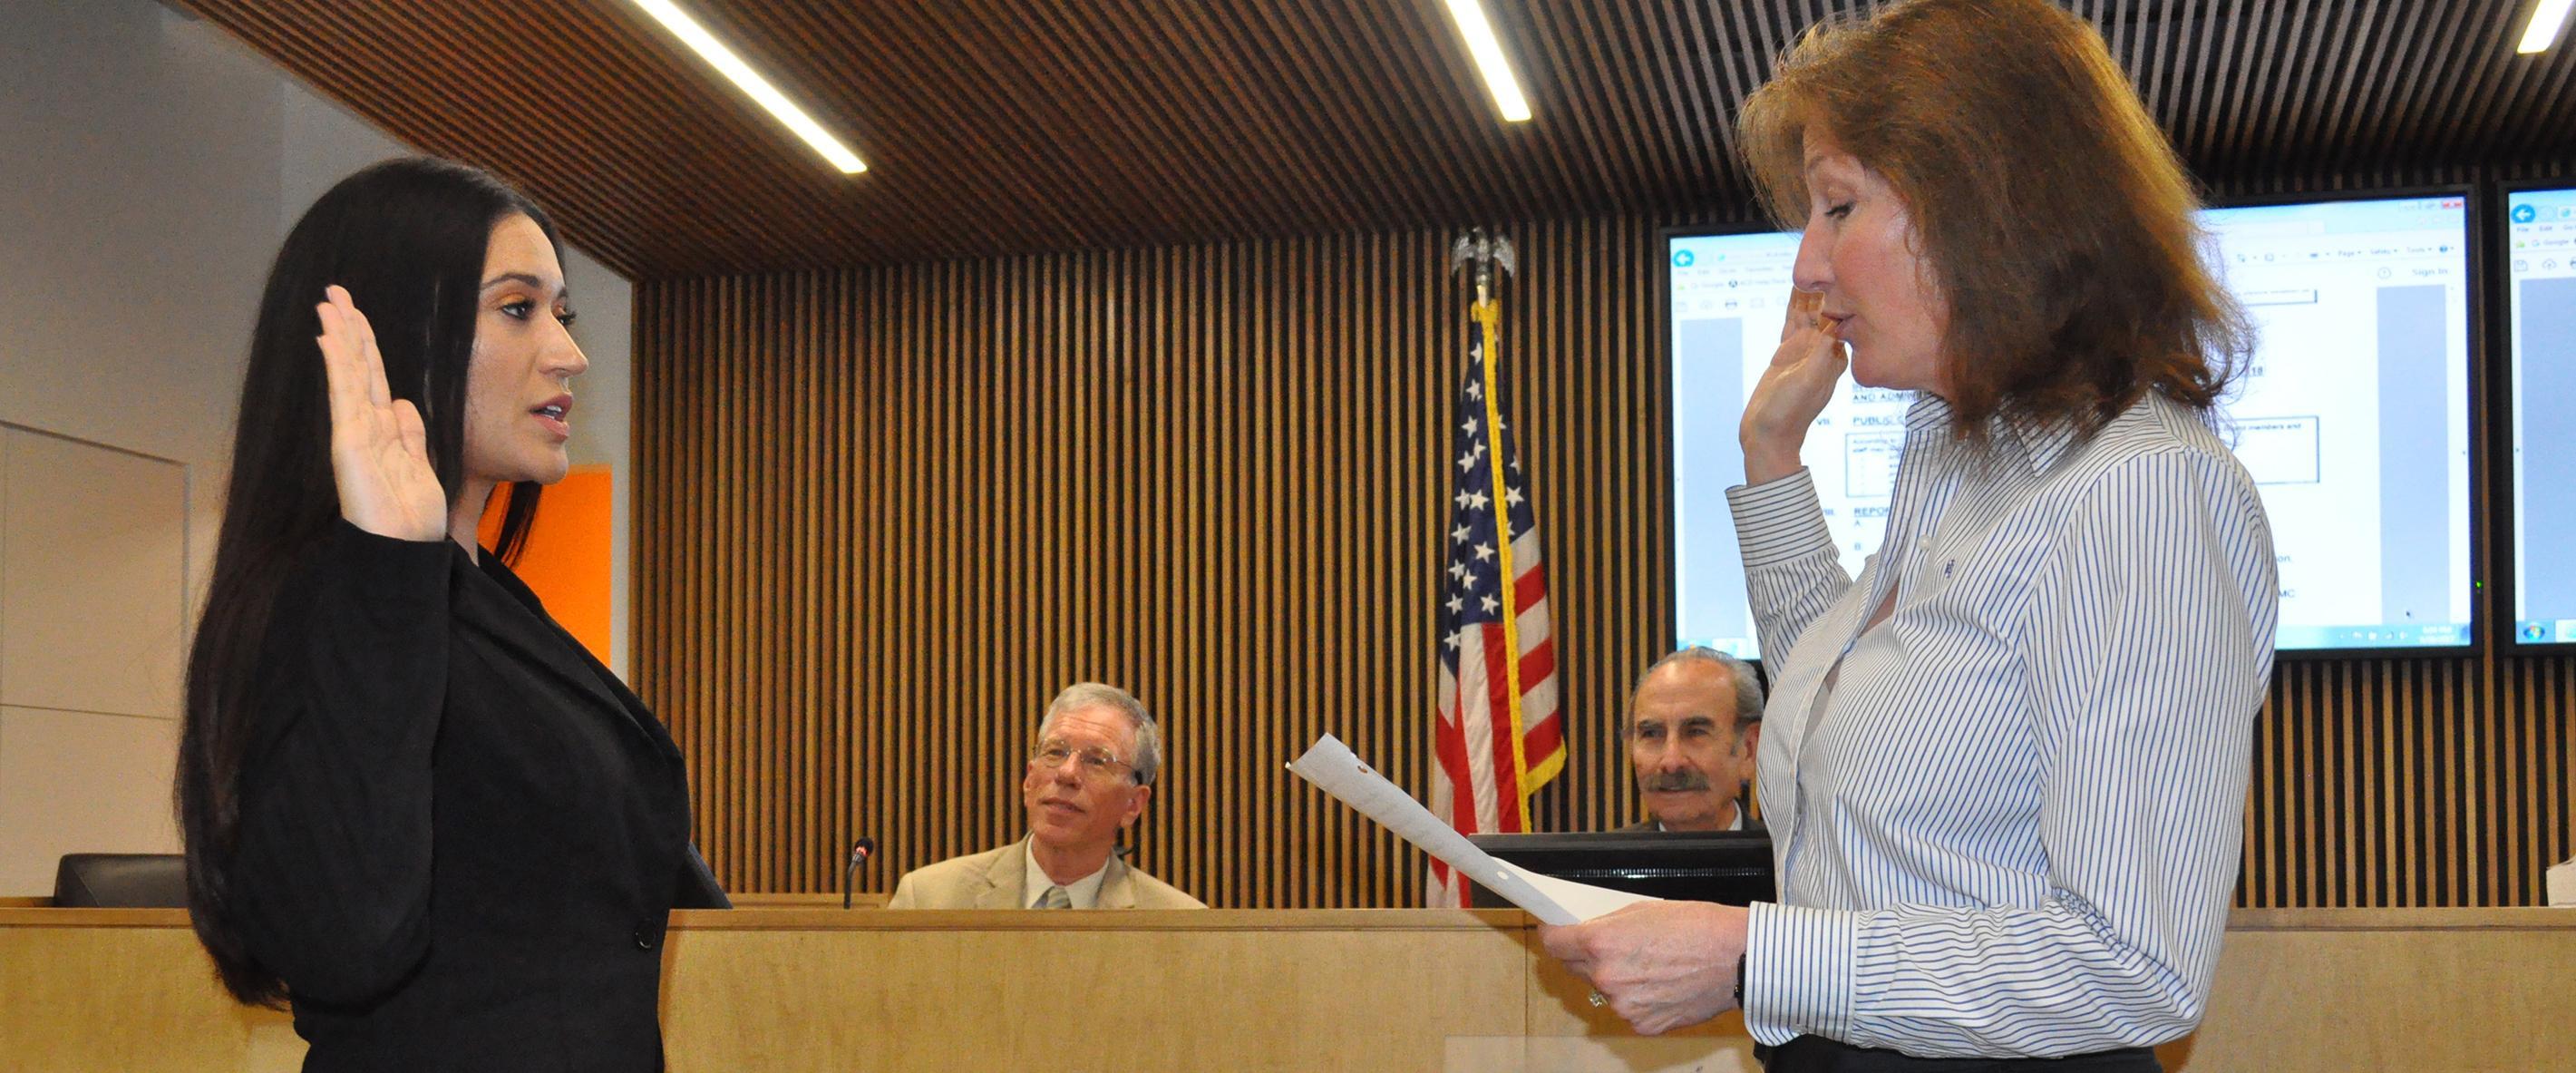 Jessica Cisneros elected to the California Community College Trustees Board.